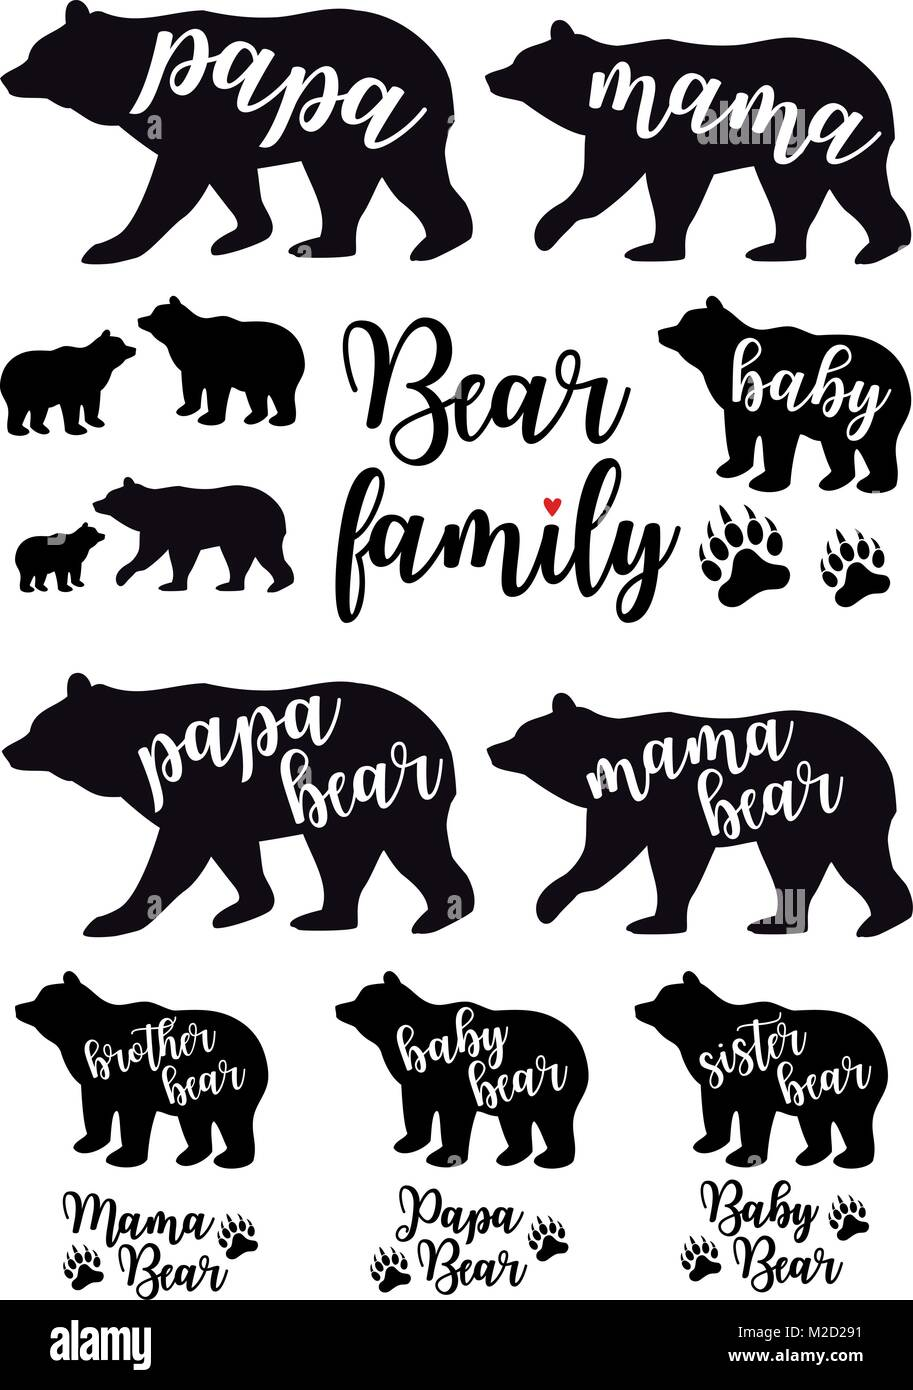 Mama Bear Papa Bear Baby Bear Silhouettes Set Of Vector